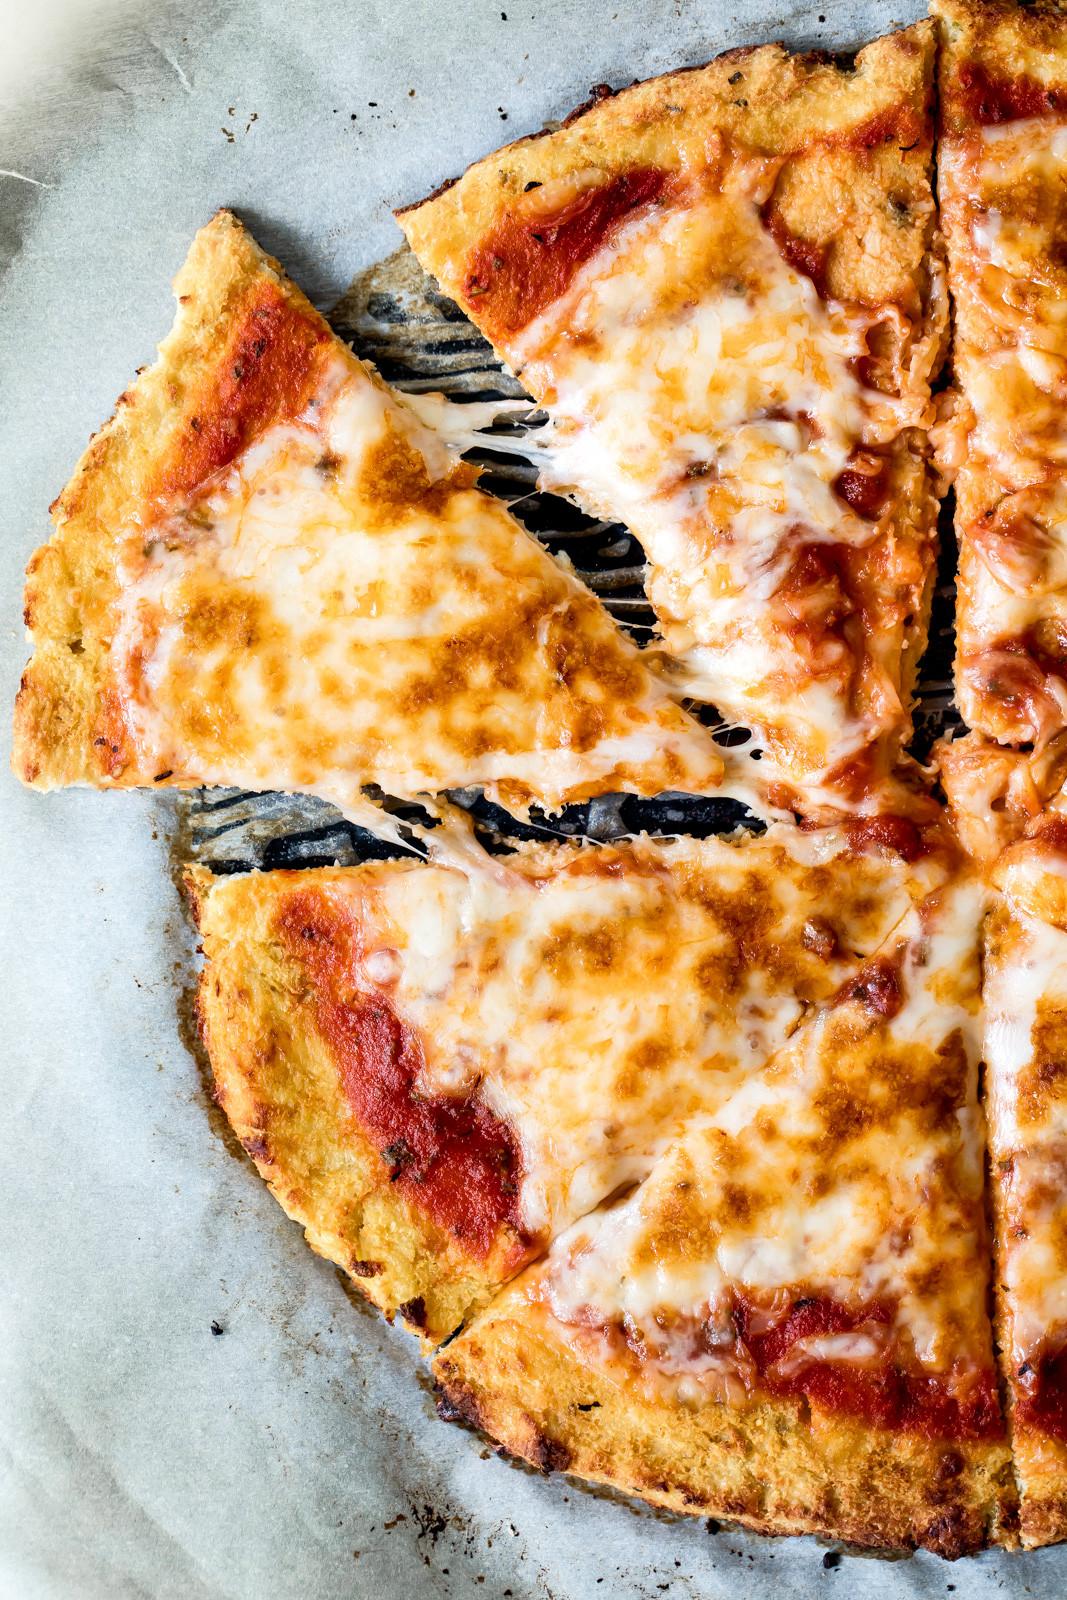 Cauliflower Pizza Crust  How to Make the Best Cauliflower Pizza Crust video